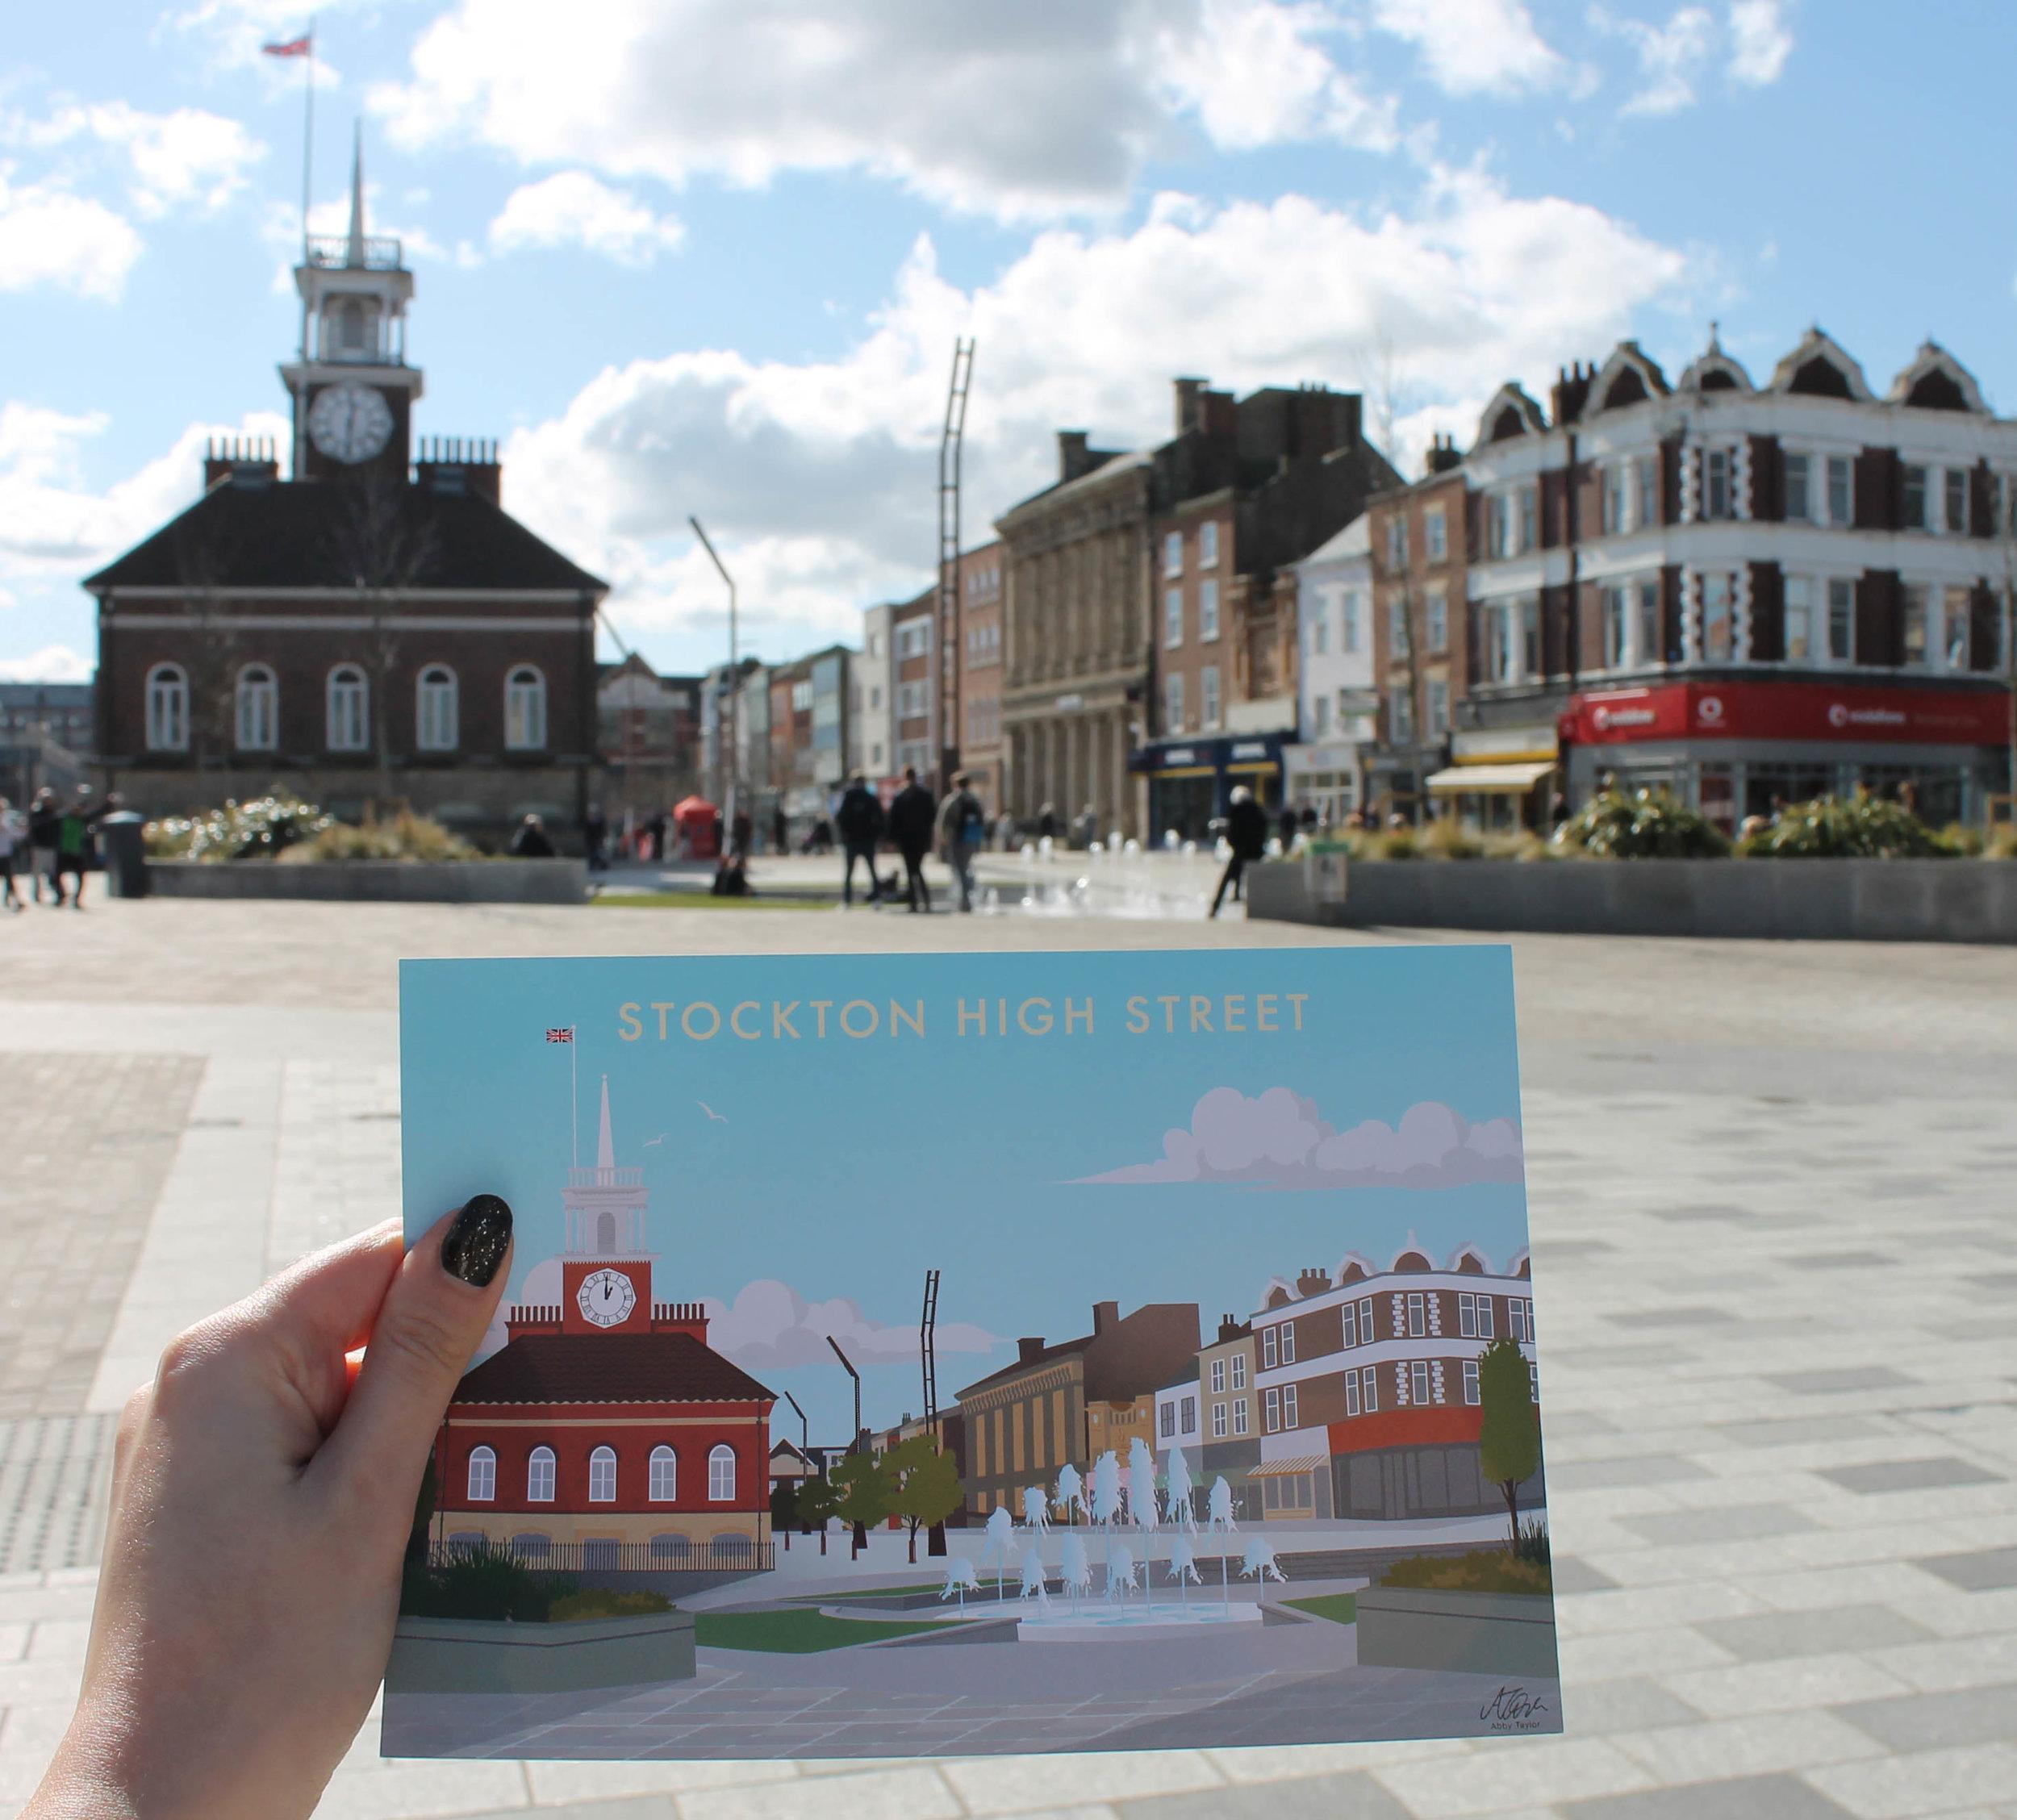 stockton high street print in situ - small.jpg